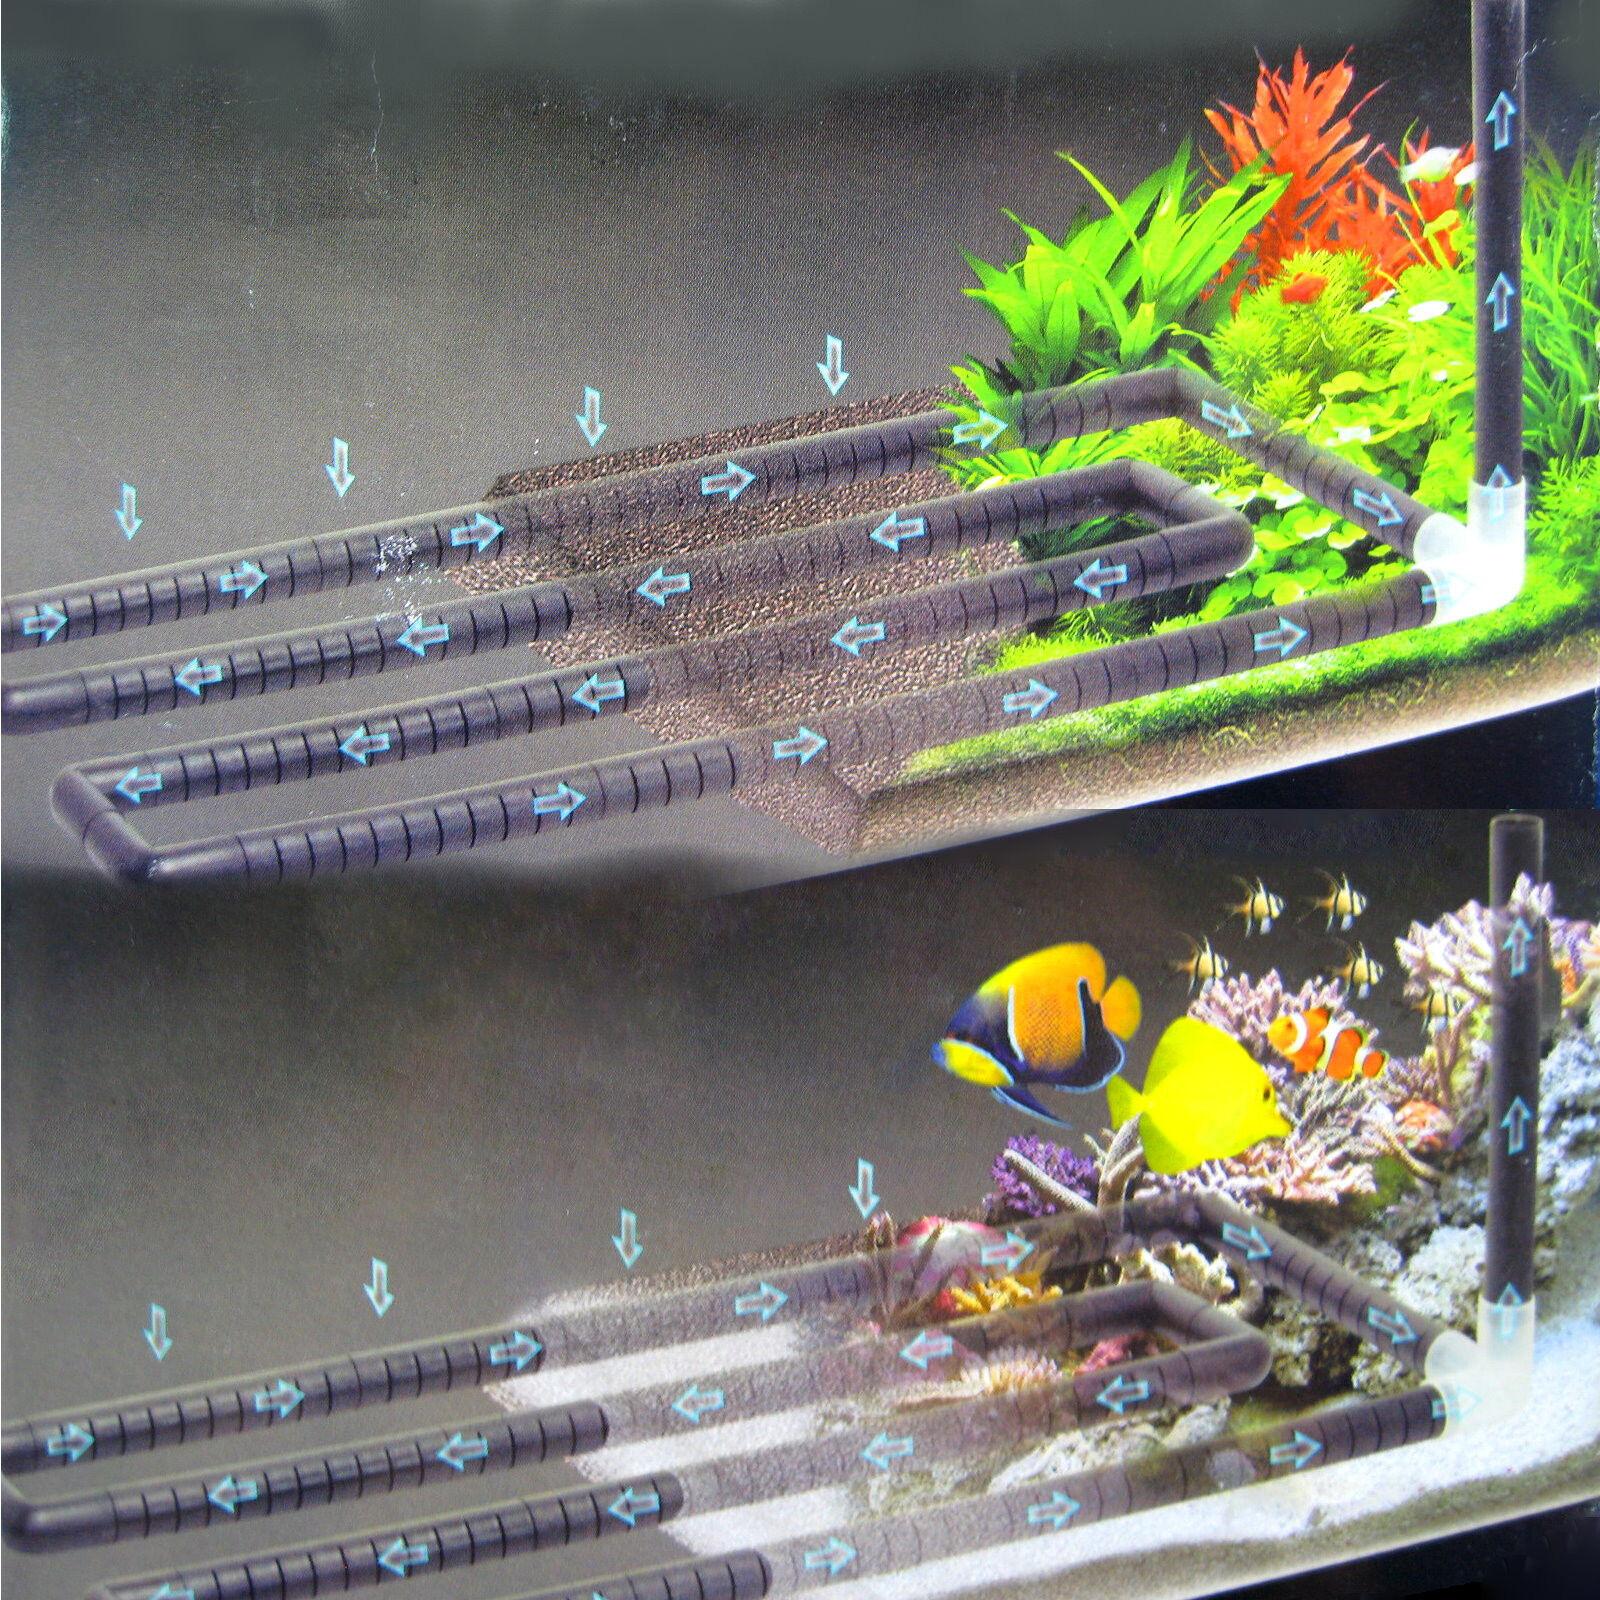 Undergravel Filteration Filteration Filteration Bottom Circular Bar 115x24.5cm Under Gravel Filter Tube 8b49a7